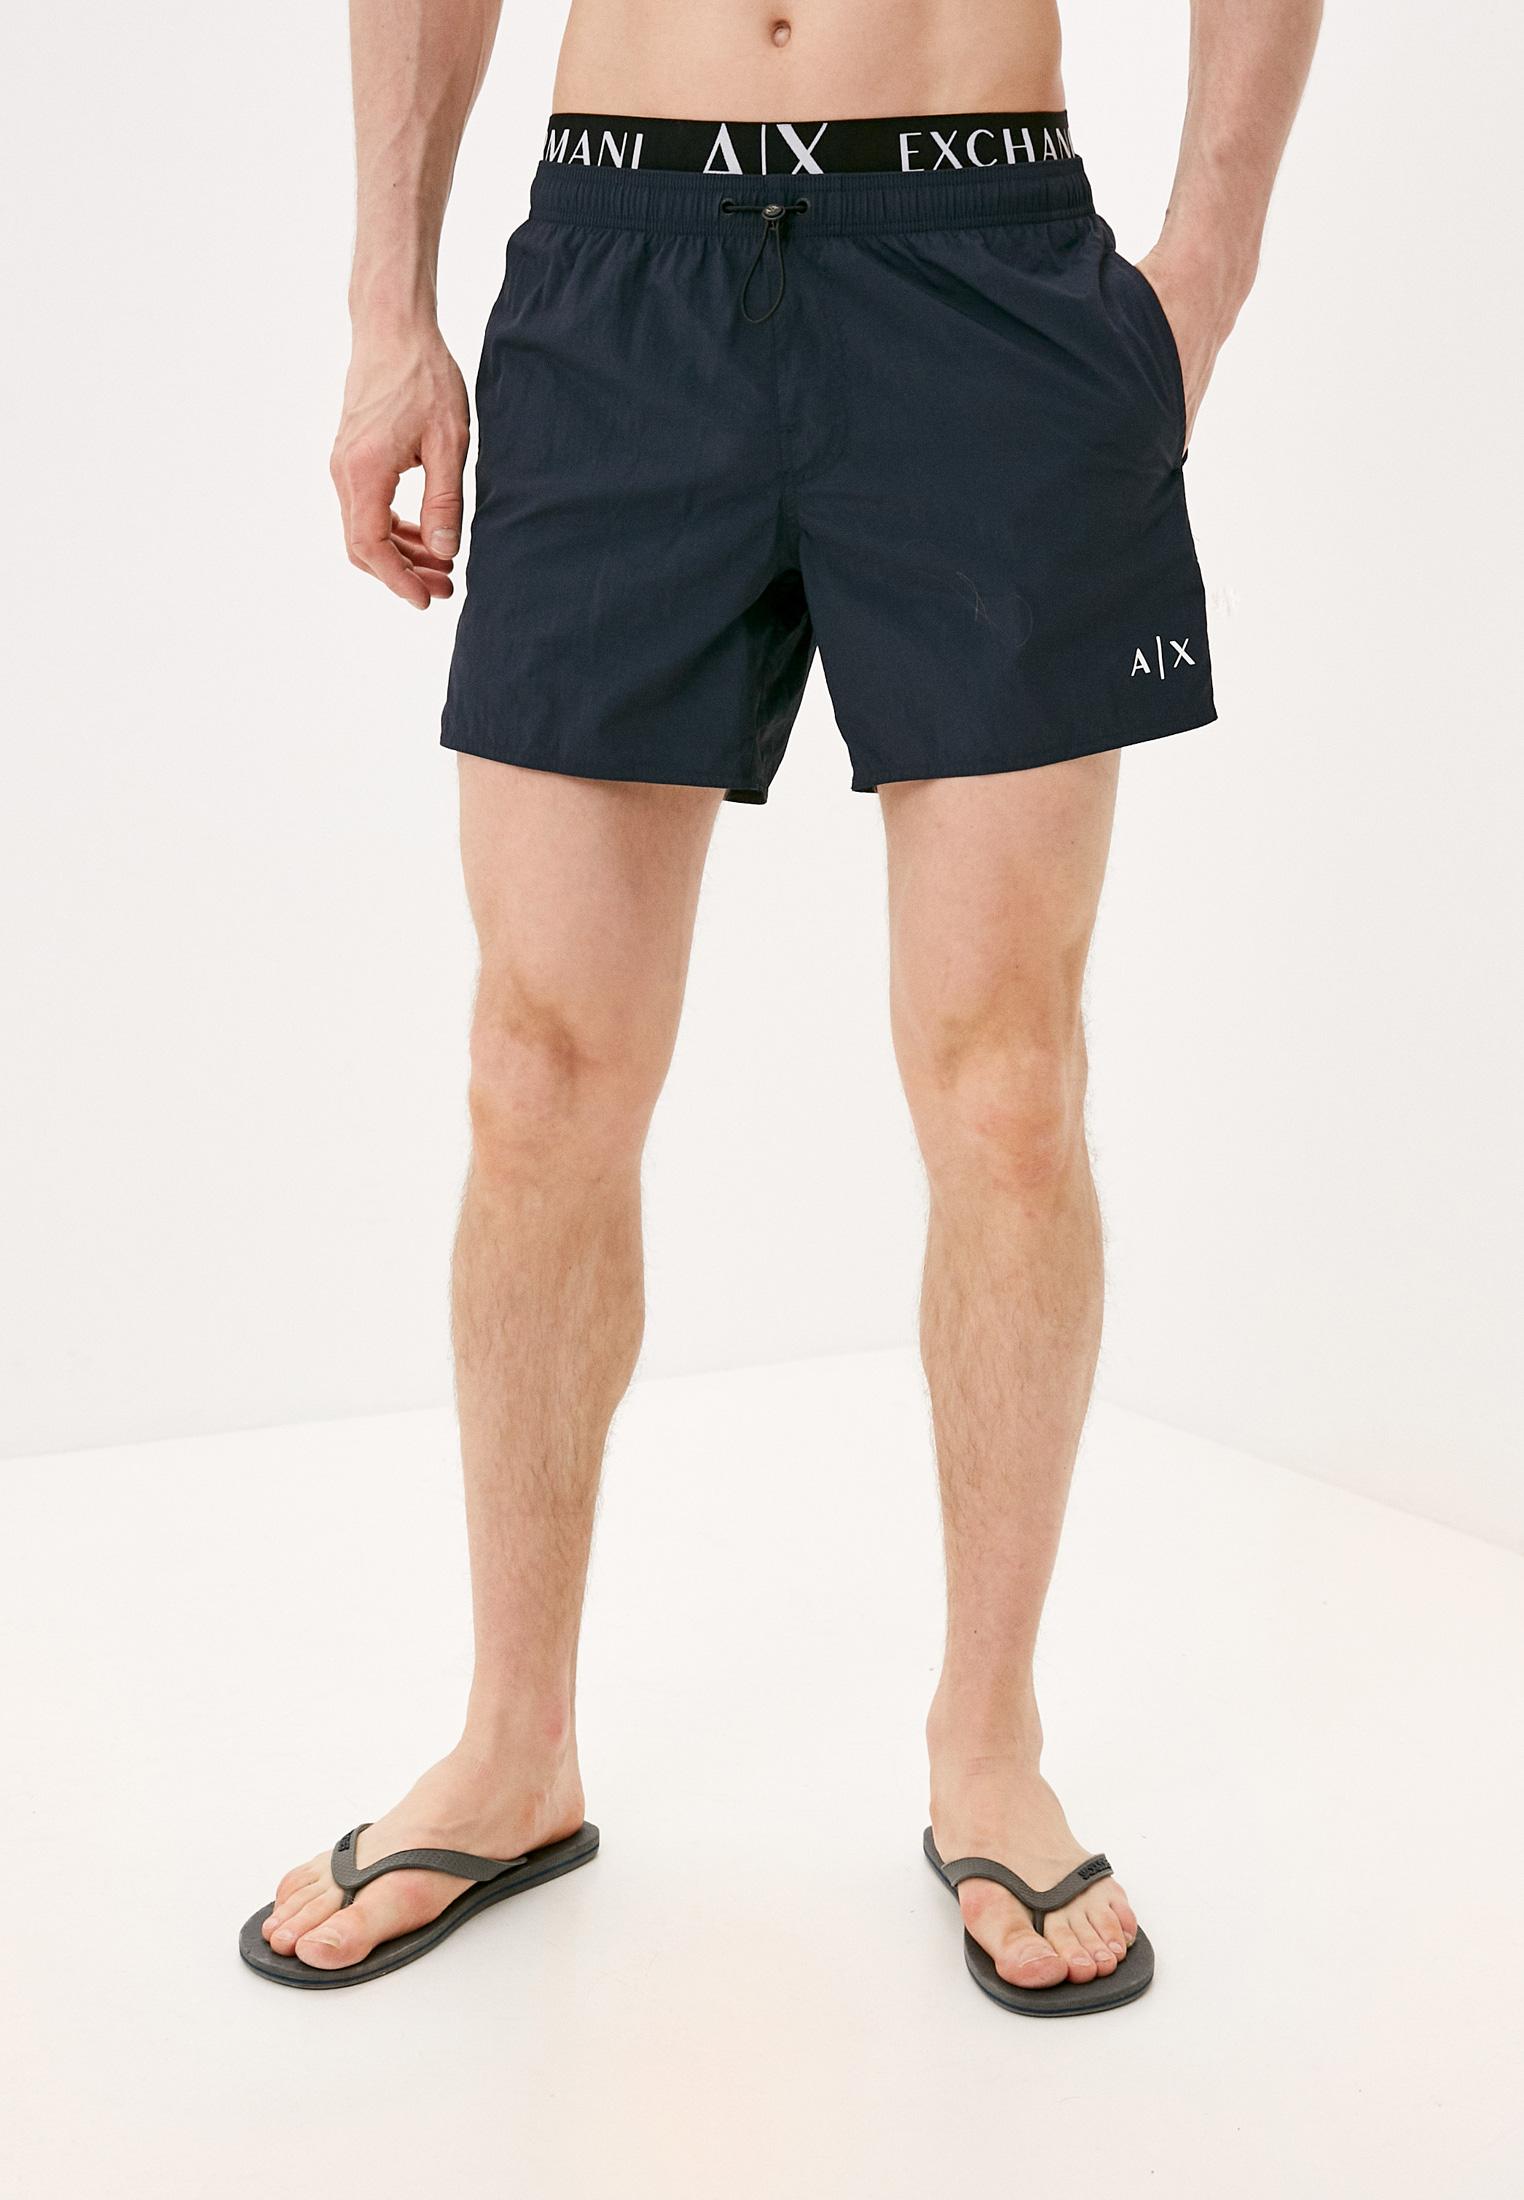 Мужские шорты для плавания Armani Exchange 953020 1P641